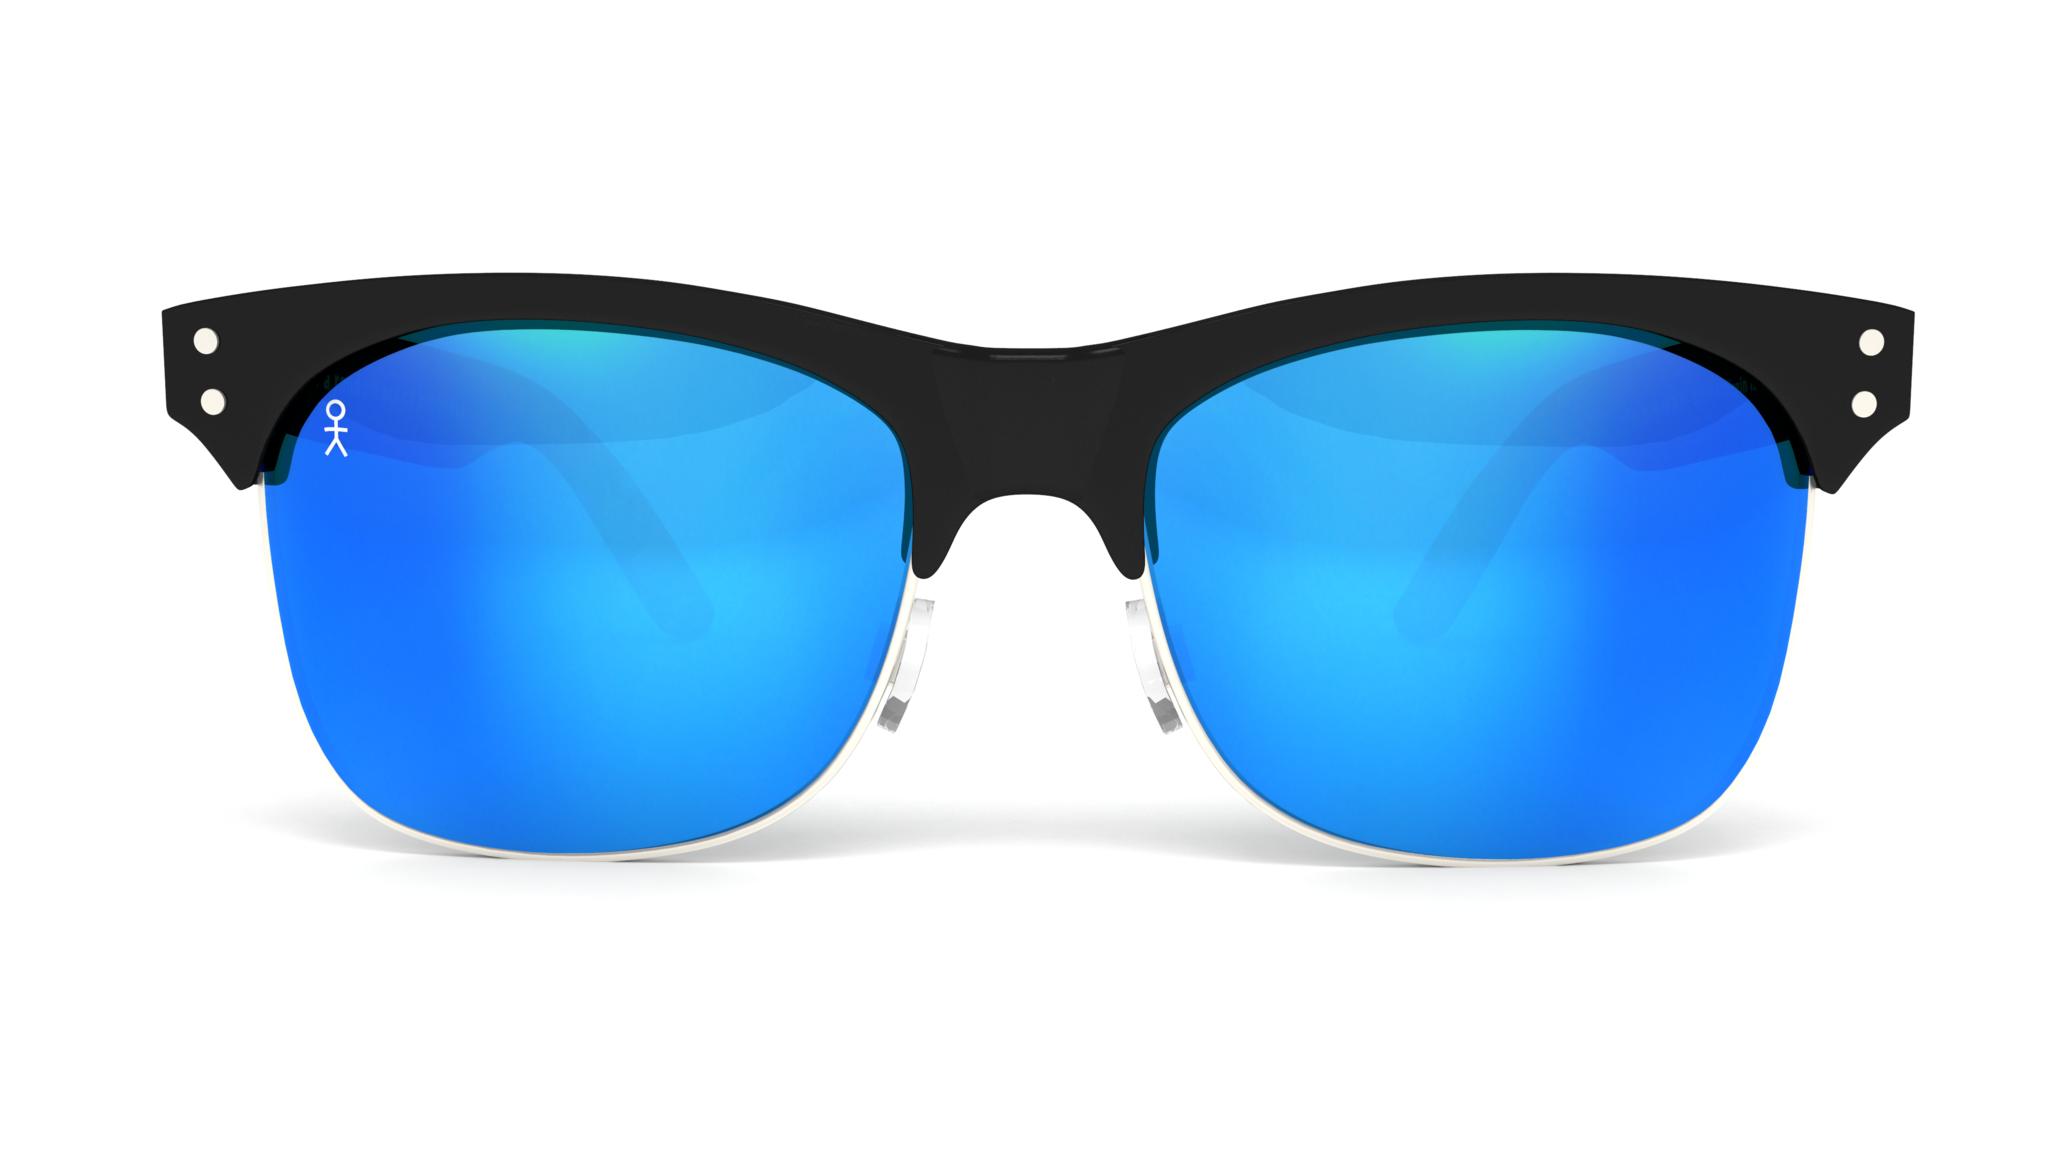 Blue Reflective Glasses